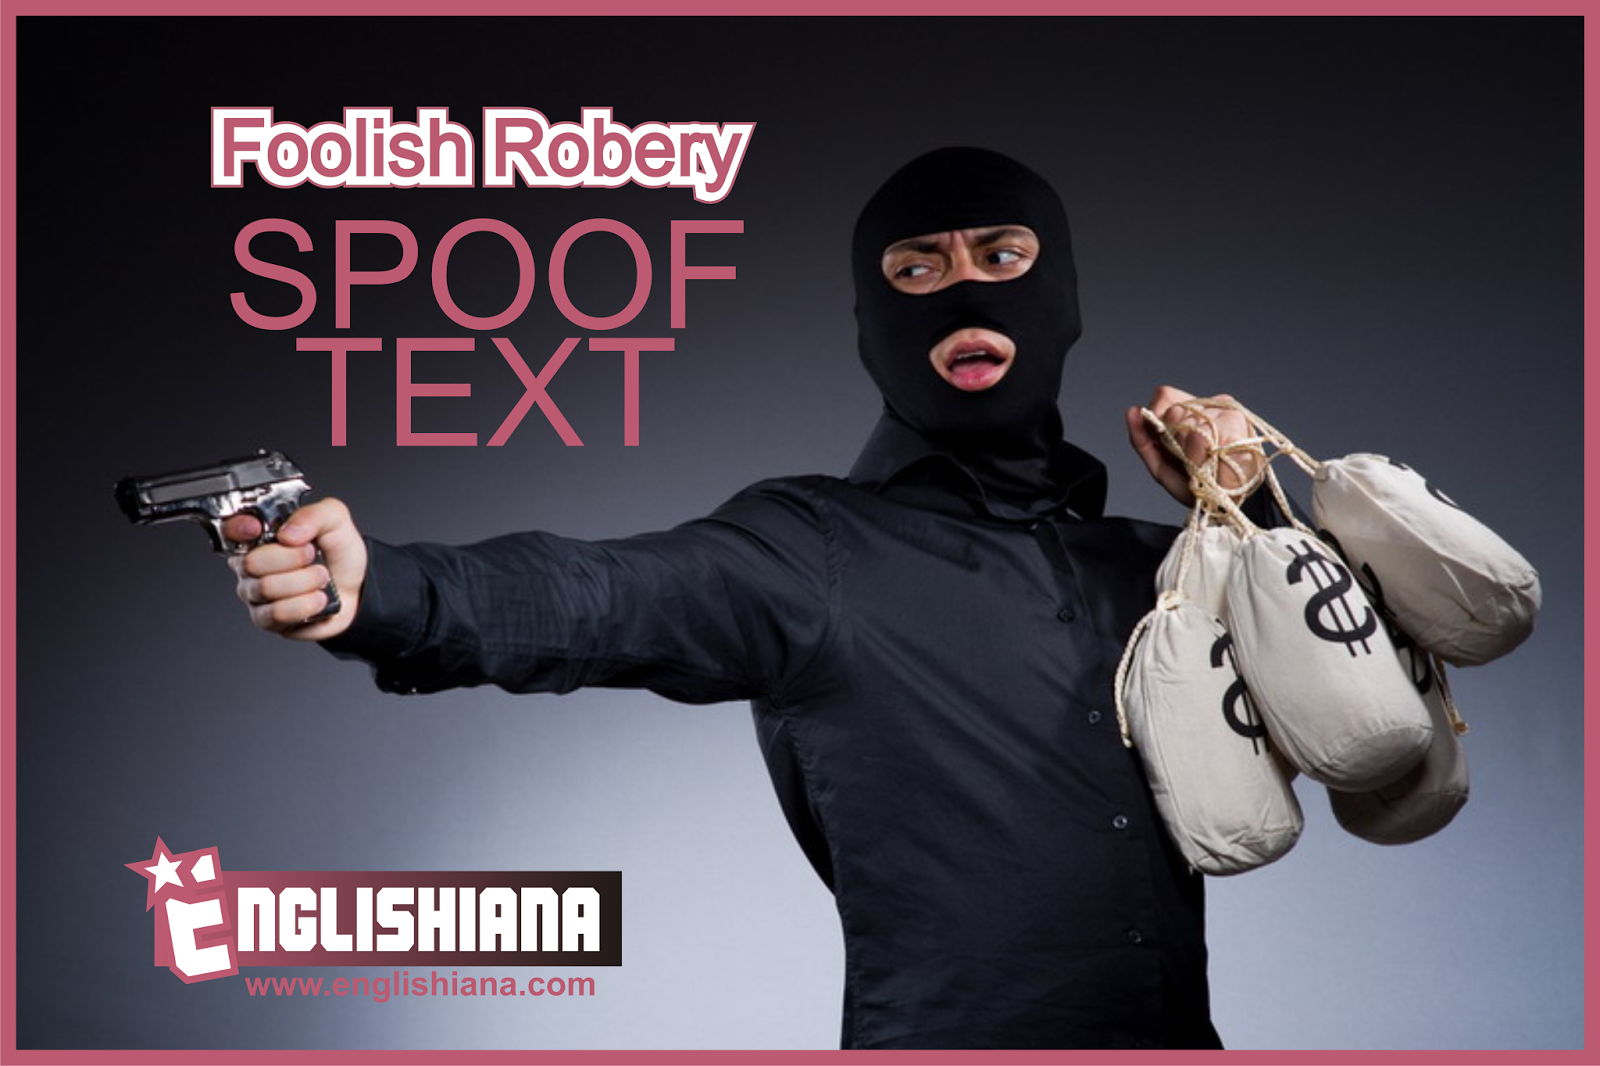 Contoh Spoof Text Kumpulan Cerita Lucu Singkat Dalam Bahasa Inggris